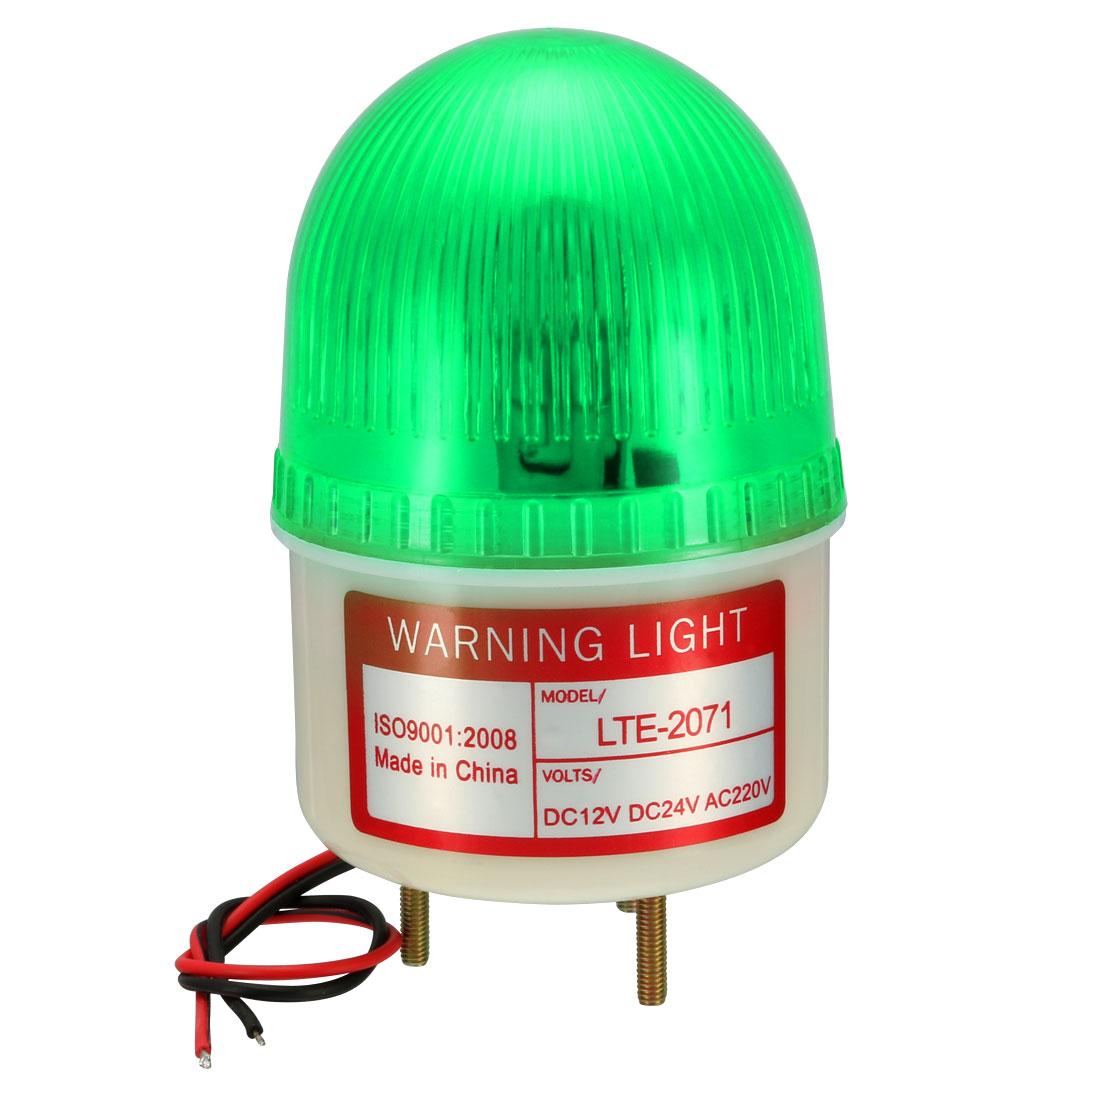 LED Warning Light Bulb Rotating FlashSignal Tower Lamp AC 220V Green LTE-2071